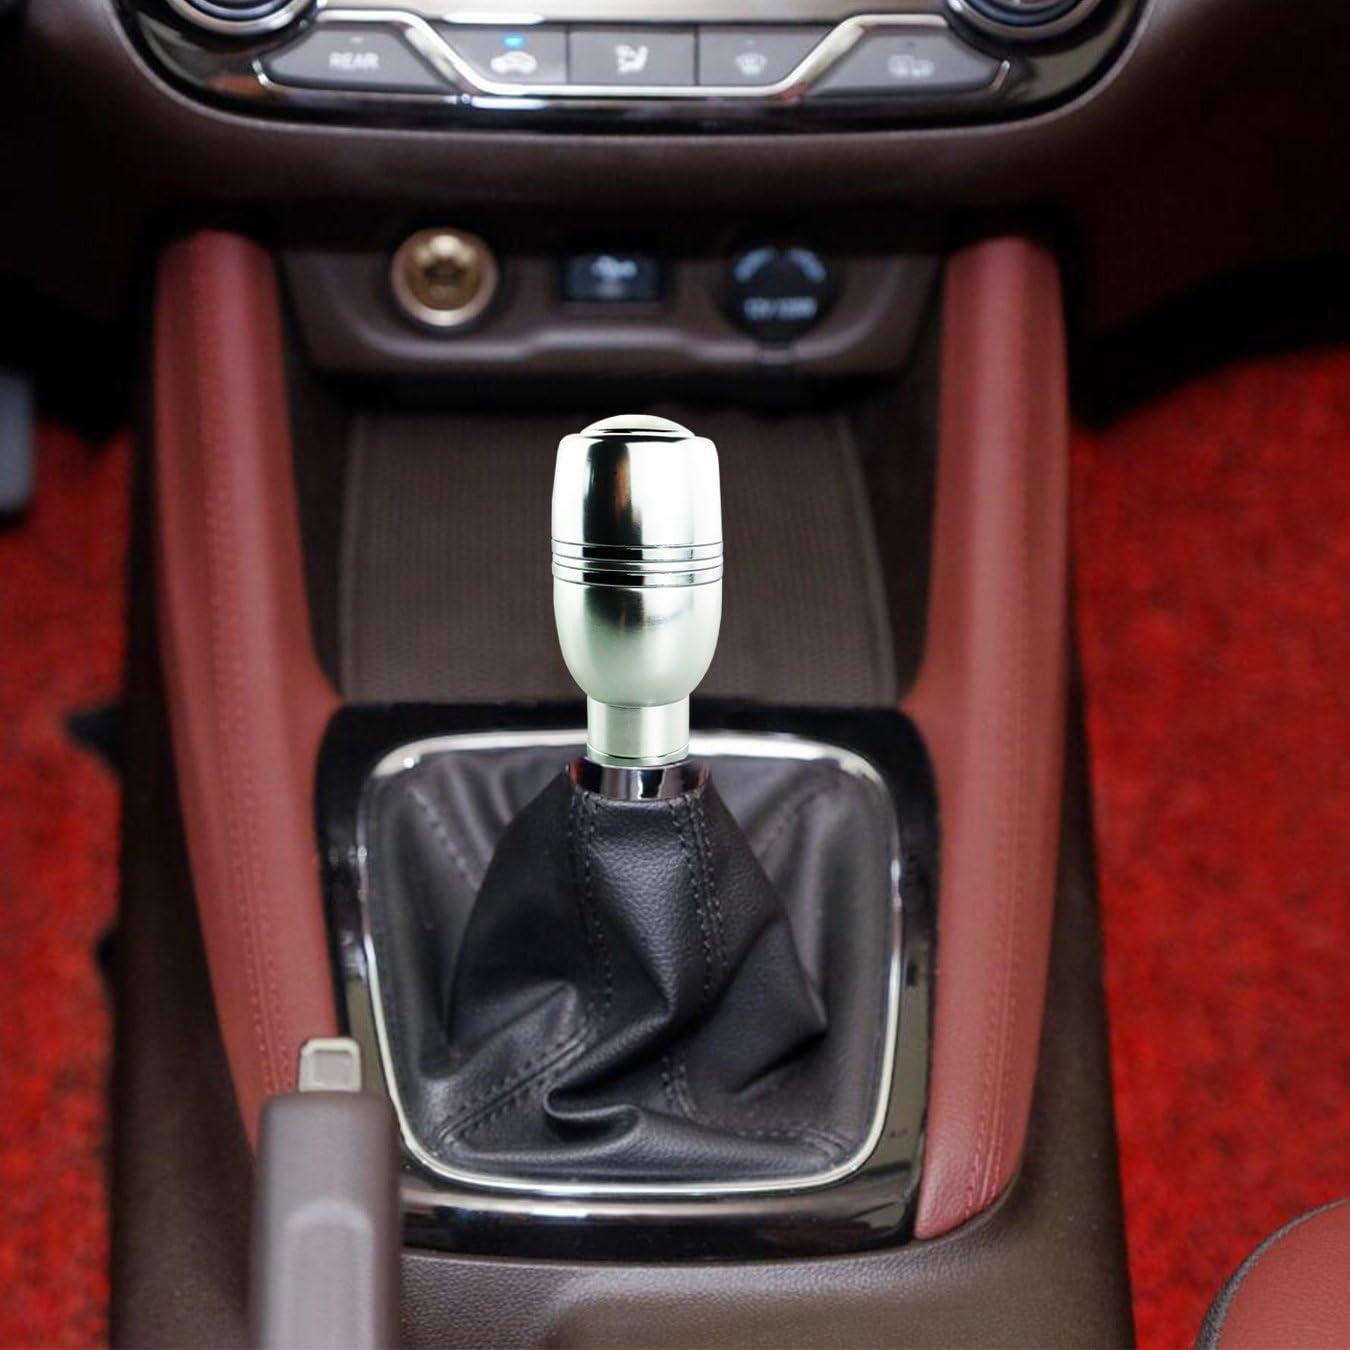 Silver Arenbel Automatic Gear Shifter Knob Button Universal Car ...